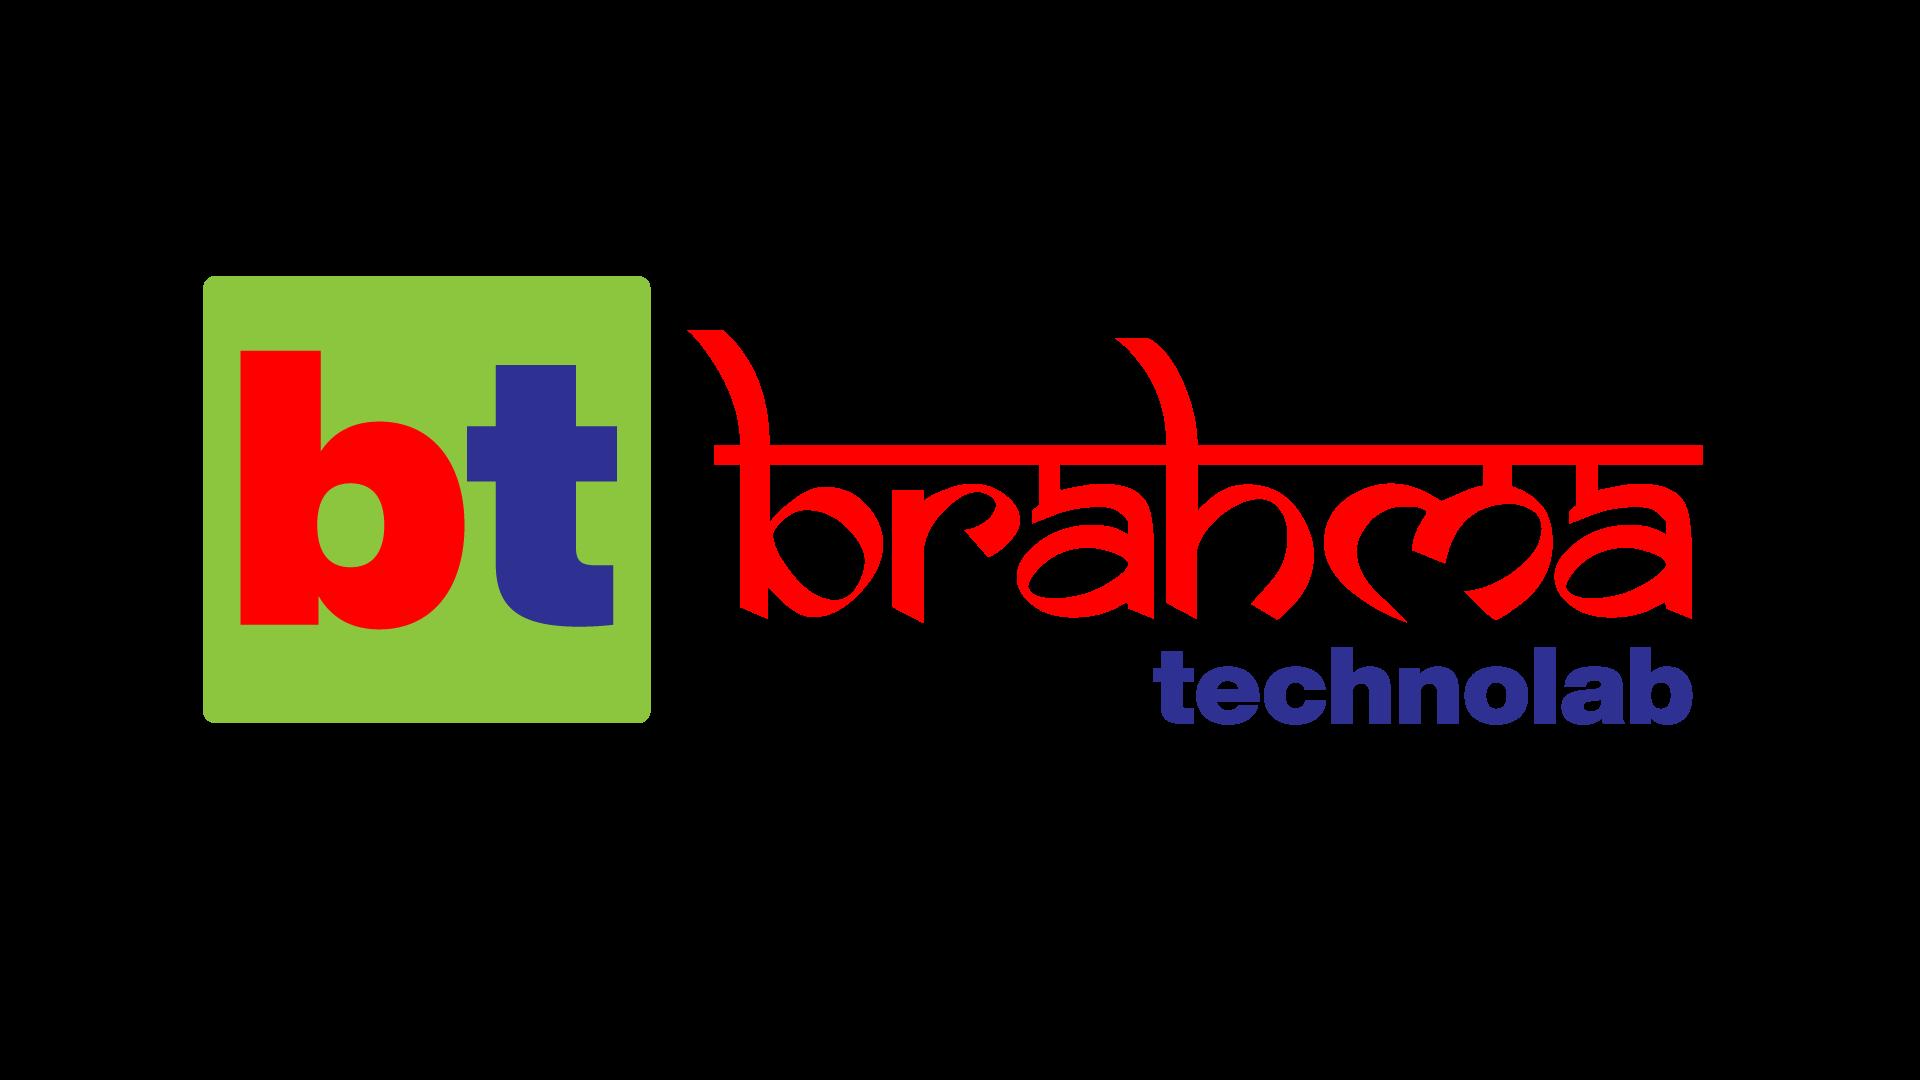 Brahma Technolab